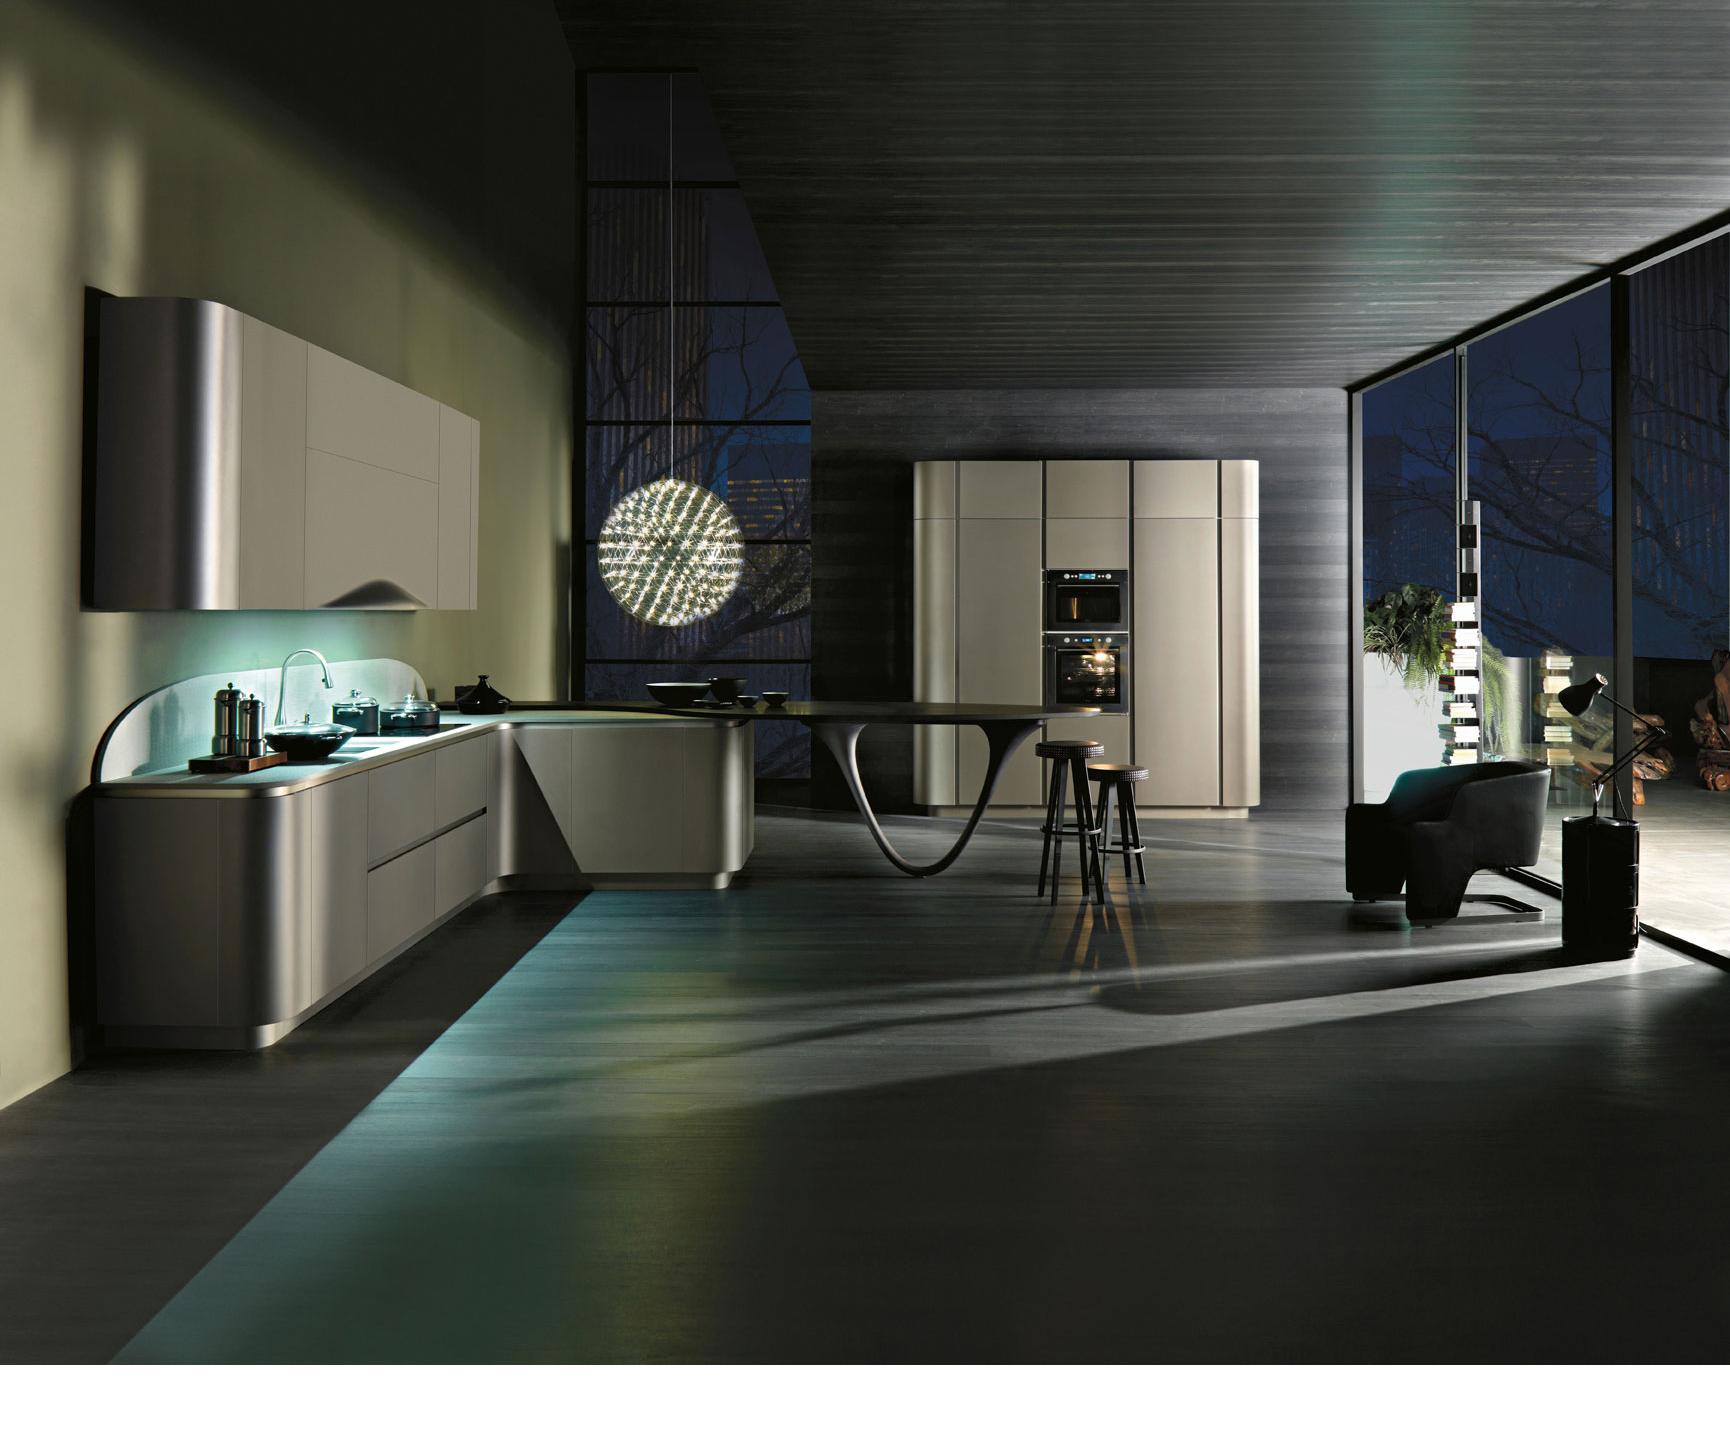 jm cuisines depuis 1975 vente installation cuisine. Black Bedroom Furniture Sets. Home Design Ideas